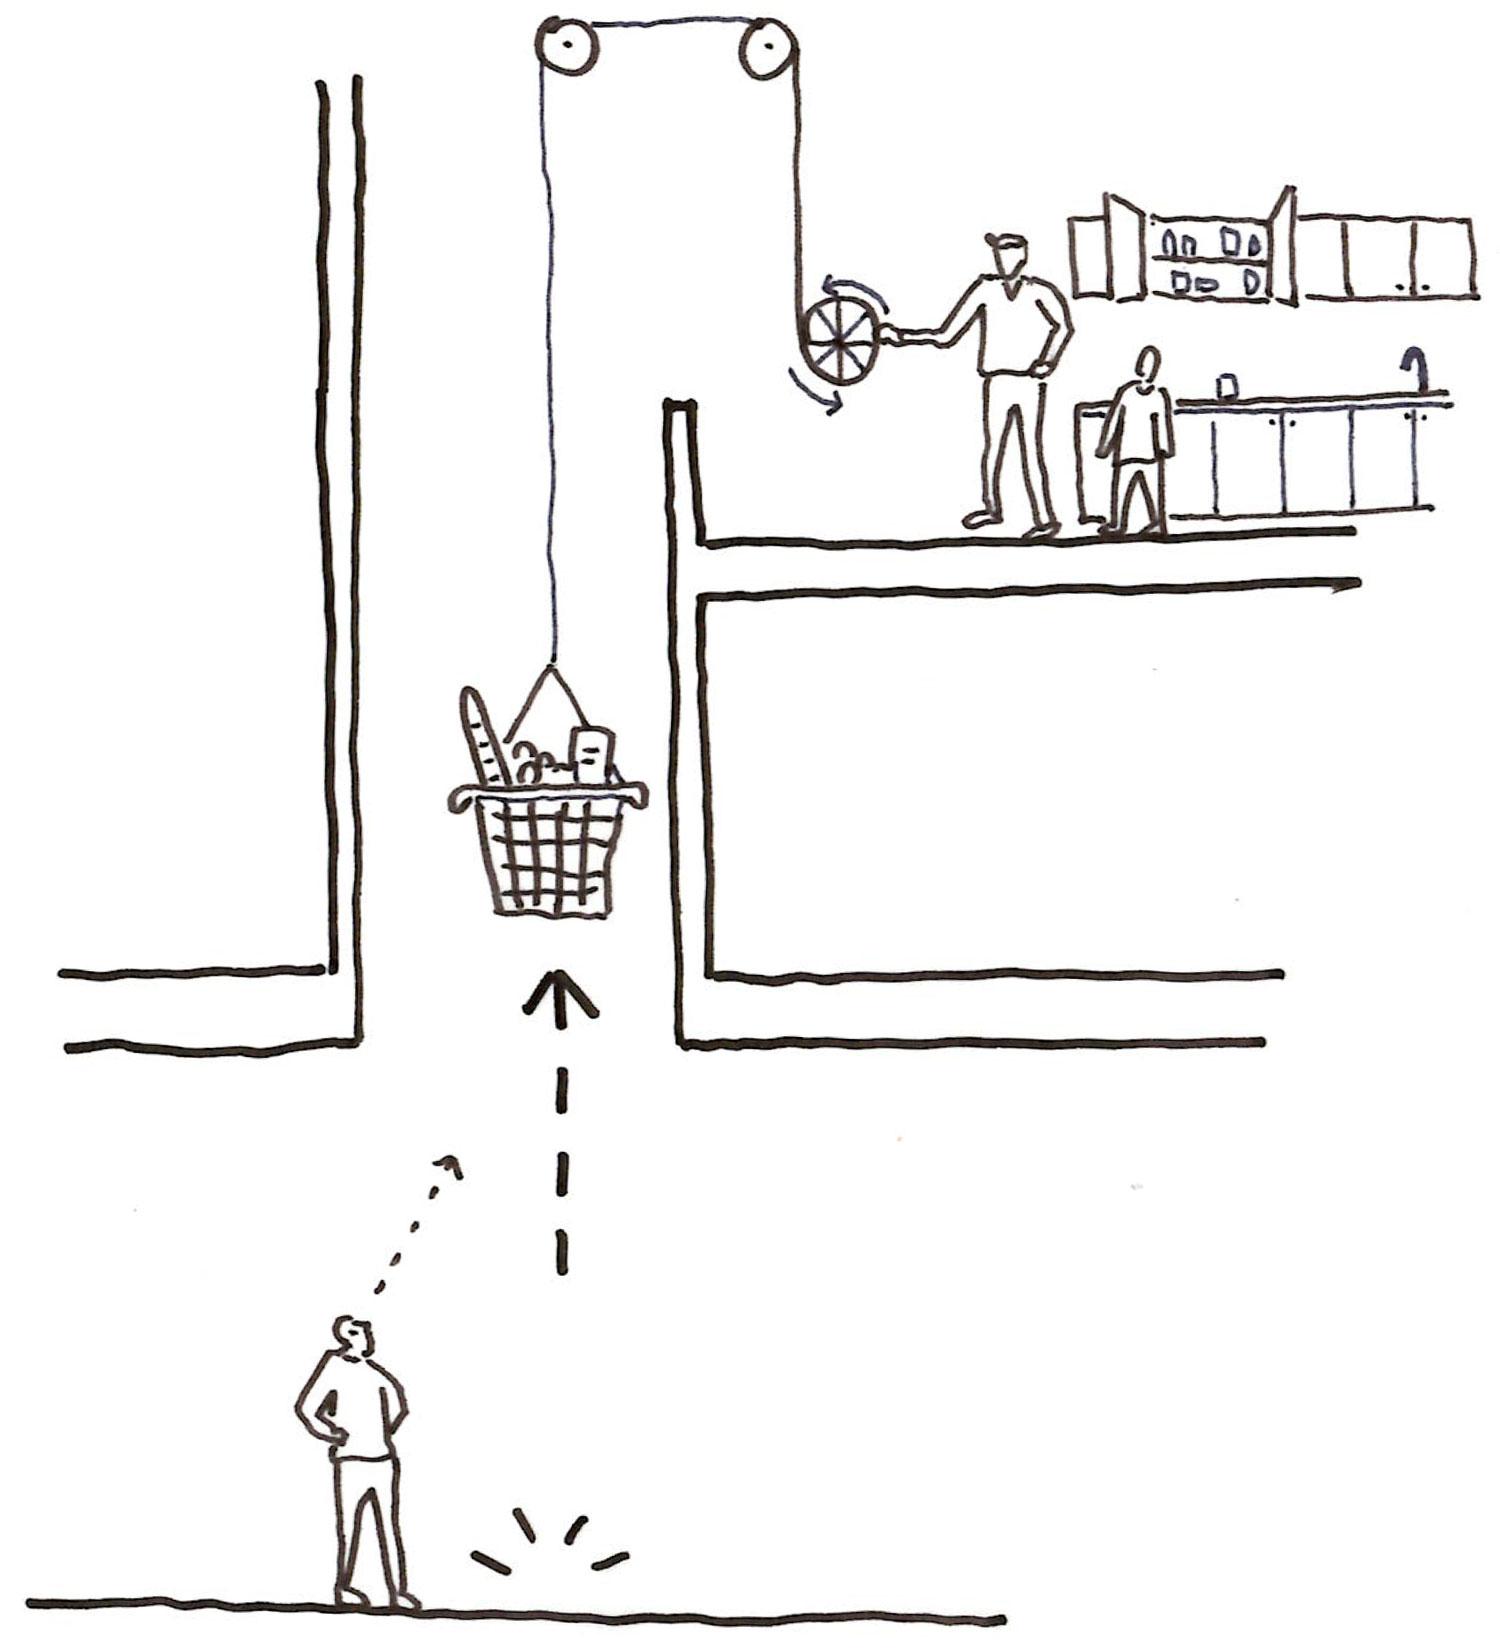 Architecture-London-Design-Freehaus-Water-Tower-Sketch-7.jpg